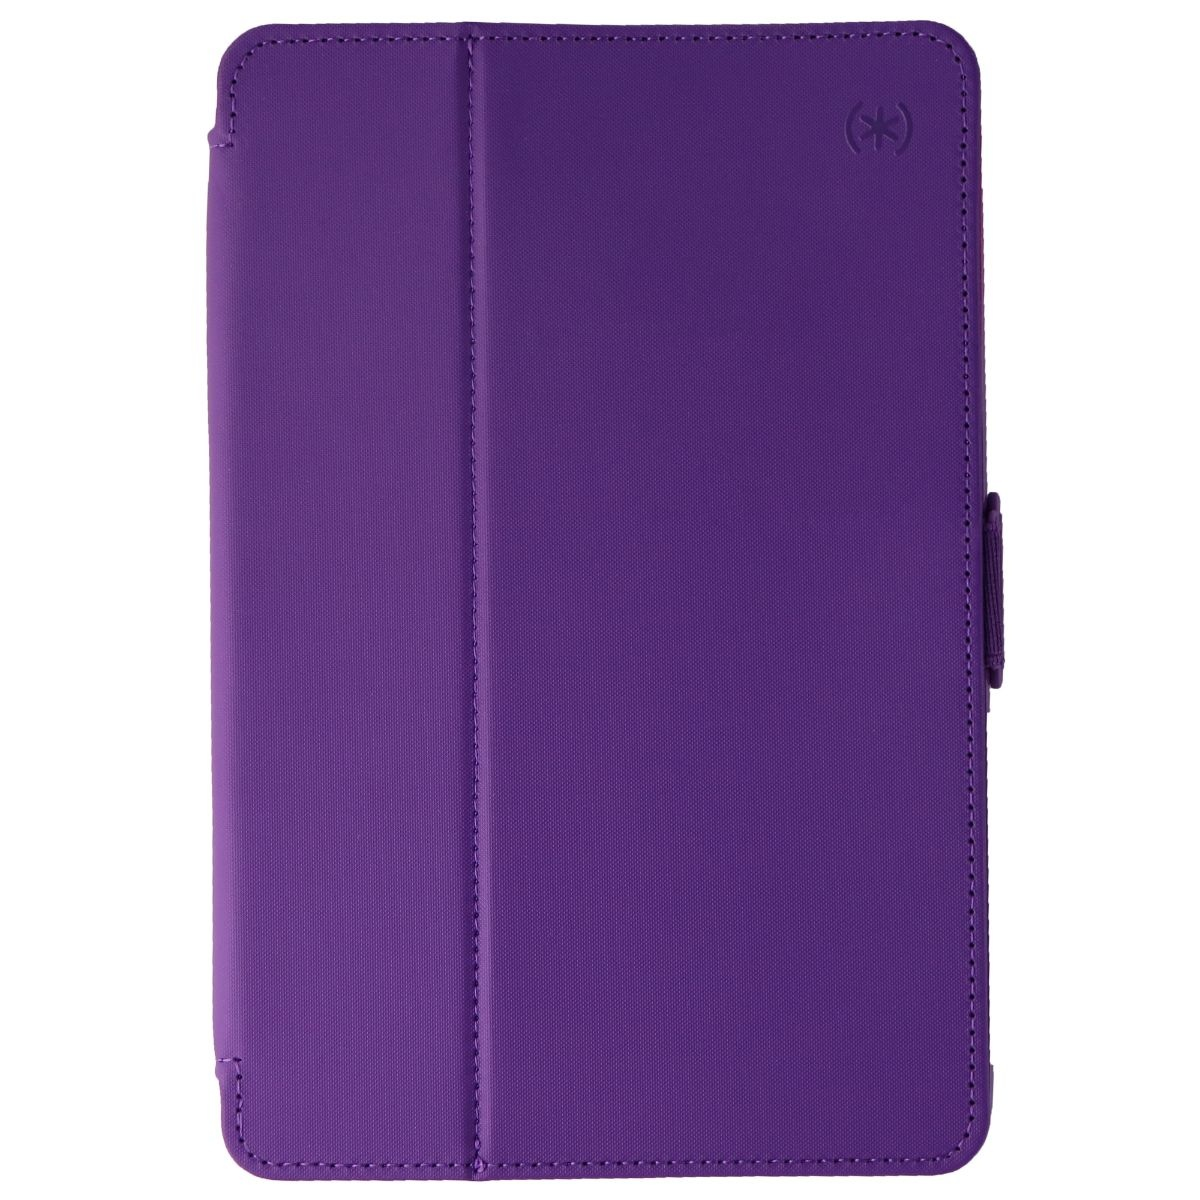 Speck Balance Folio Case Compatible with iPad Mini (2019) / iPad mini 4 - Purple